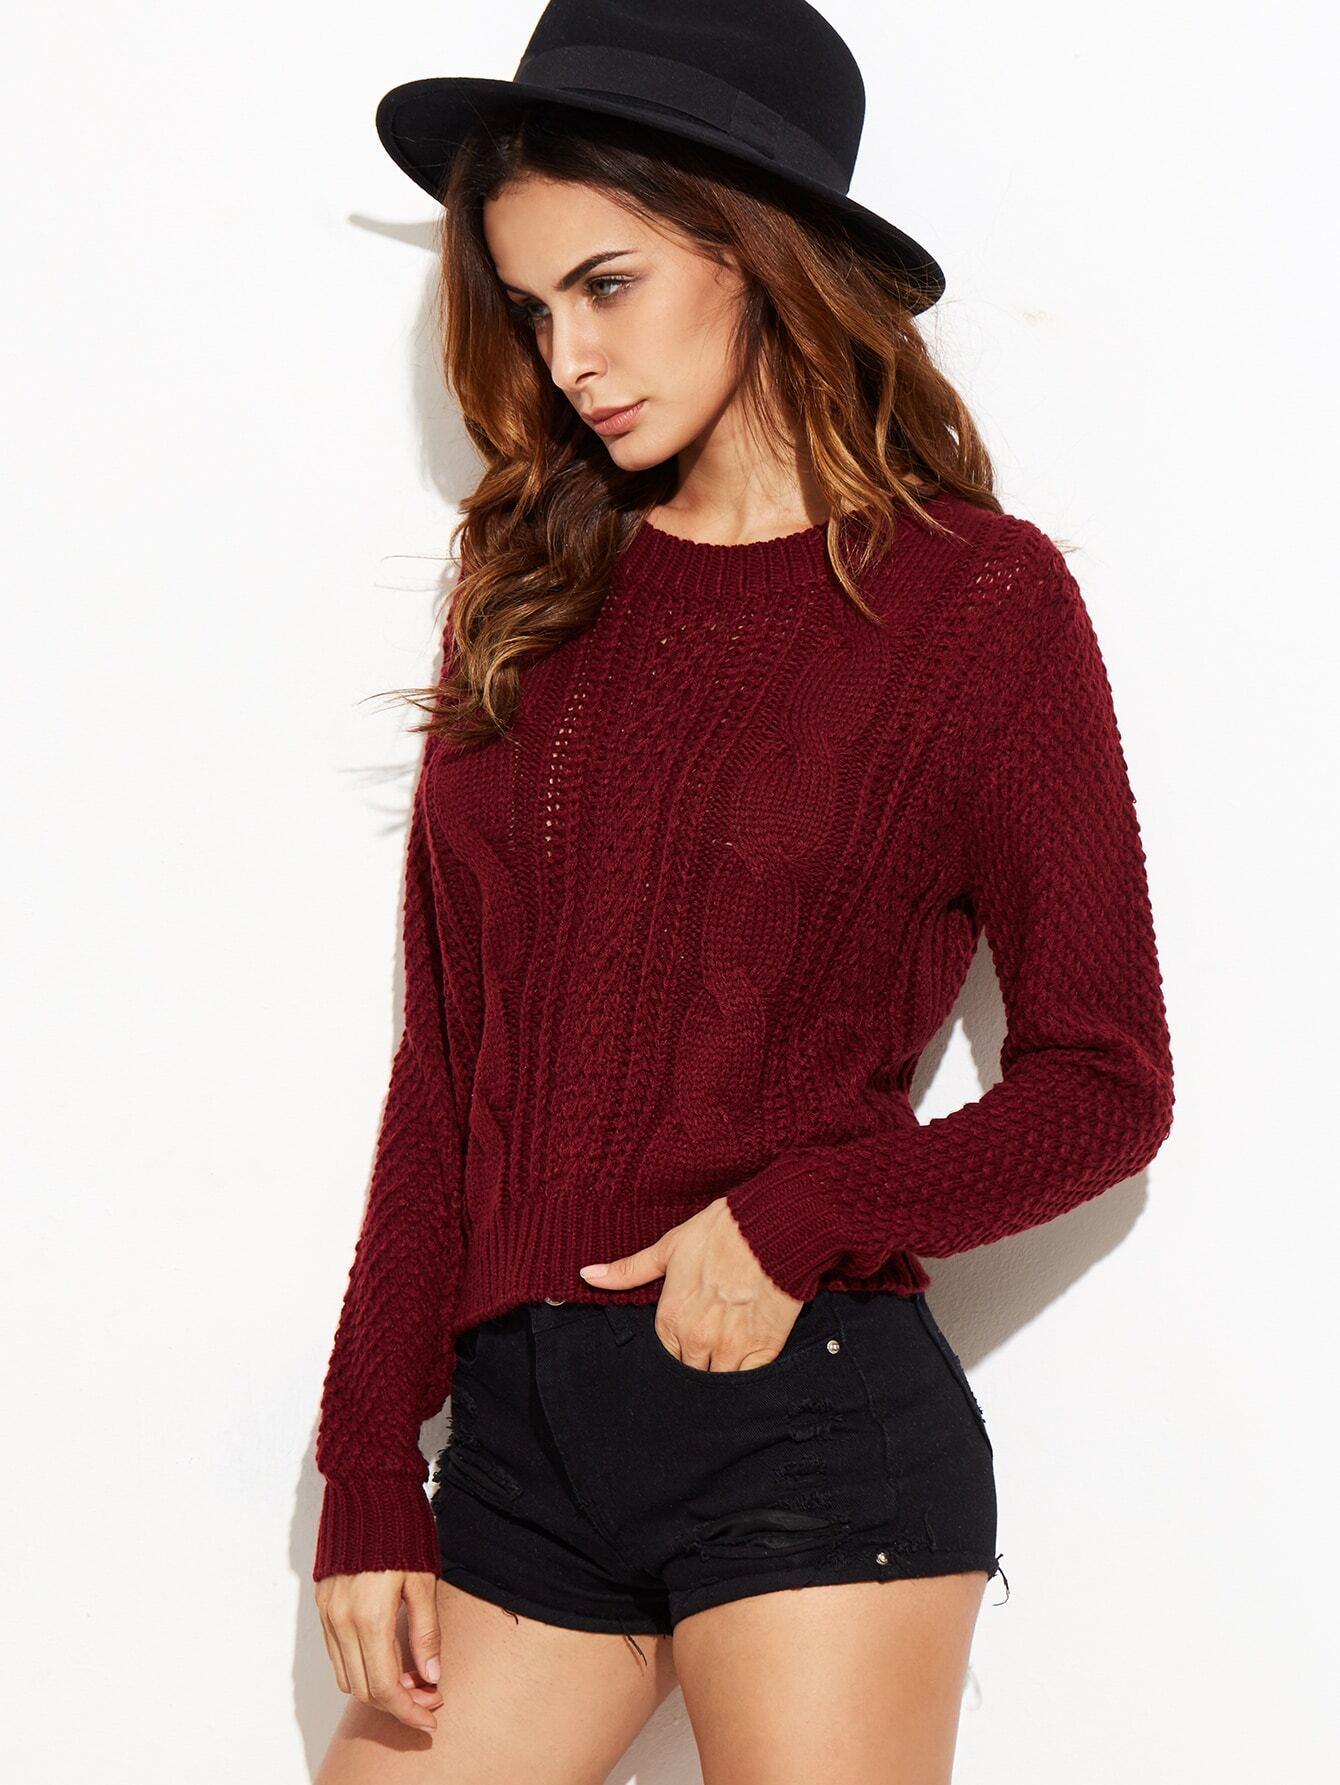 sweater160901458_2